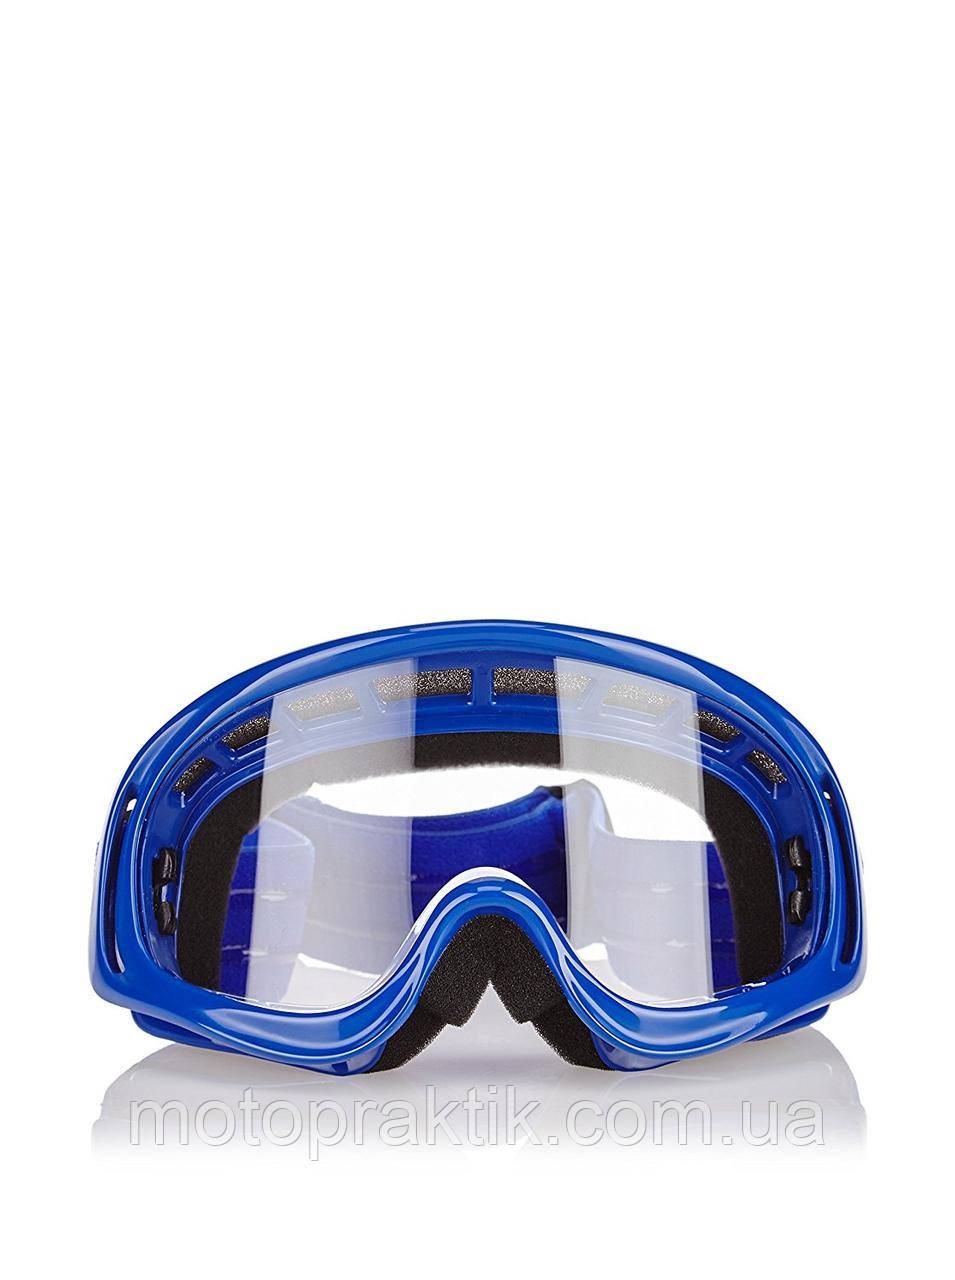 Outstars RO 4062 Google, Blue, Маска/очки кросс/лыжная